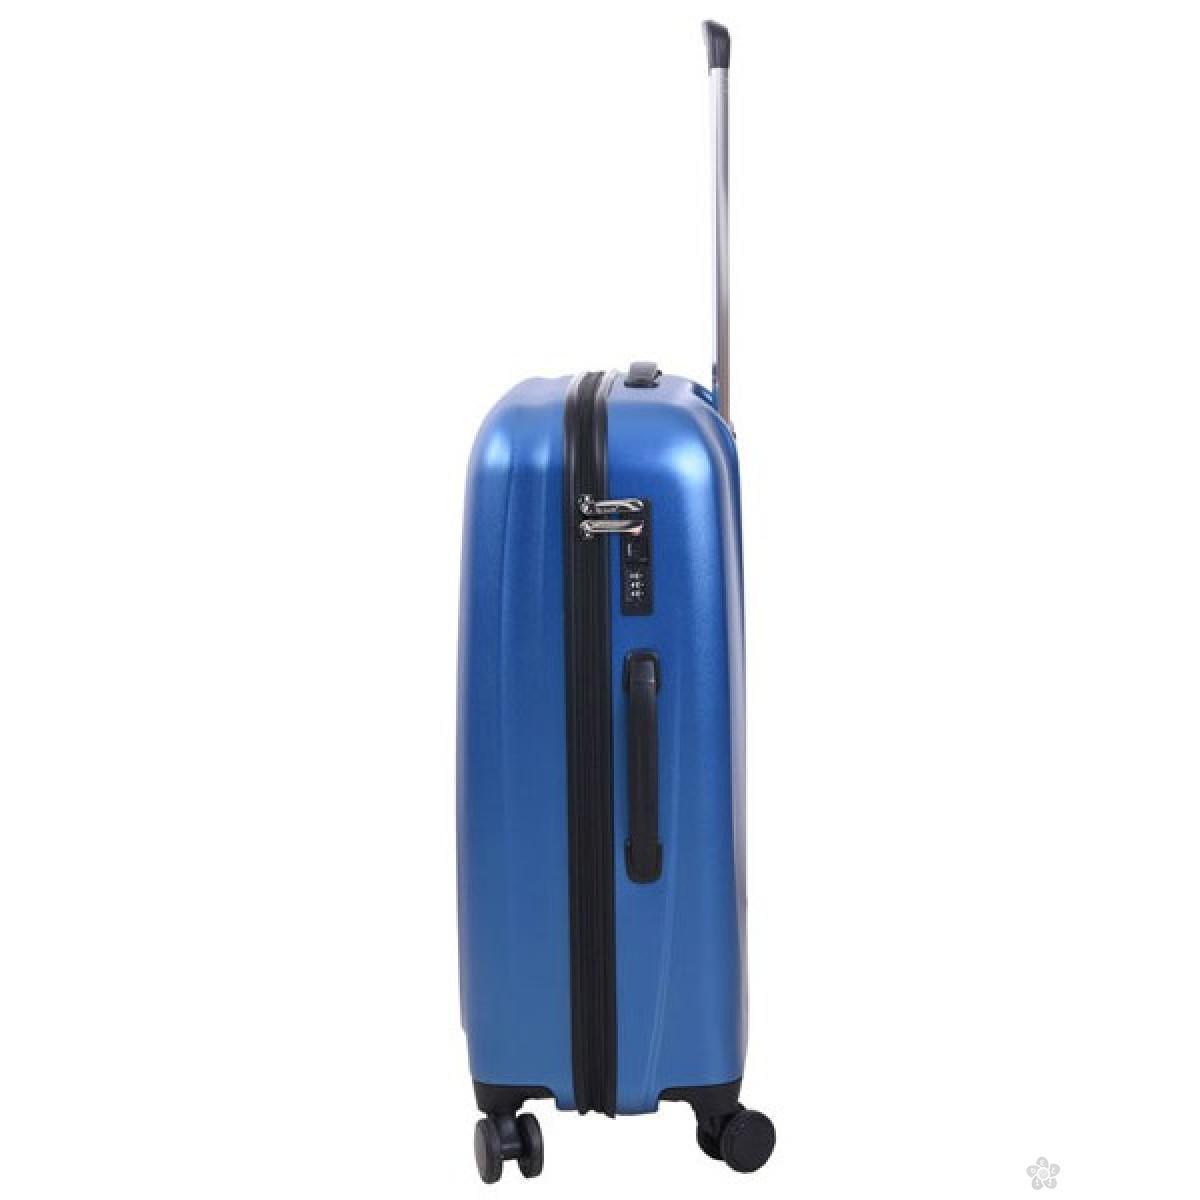 Kofer Pulse Manhattan plavi 24inch X21156